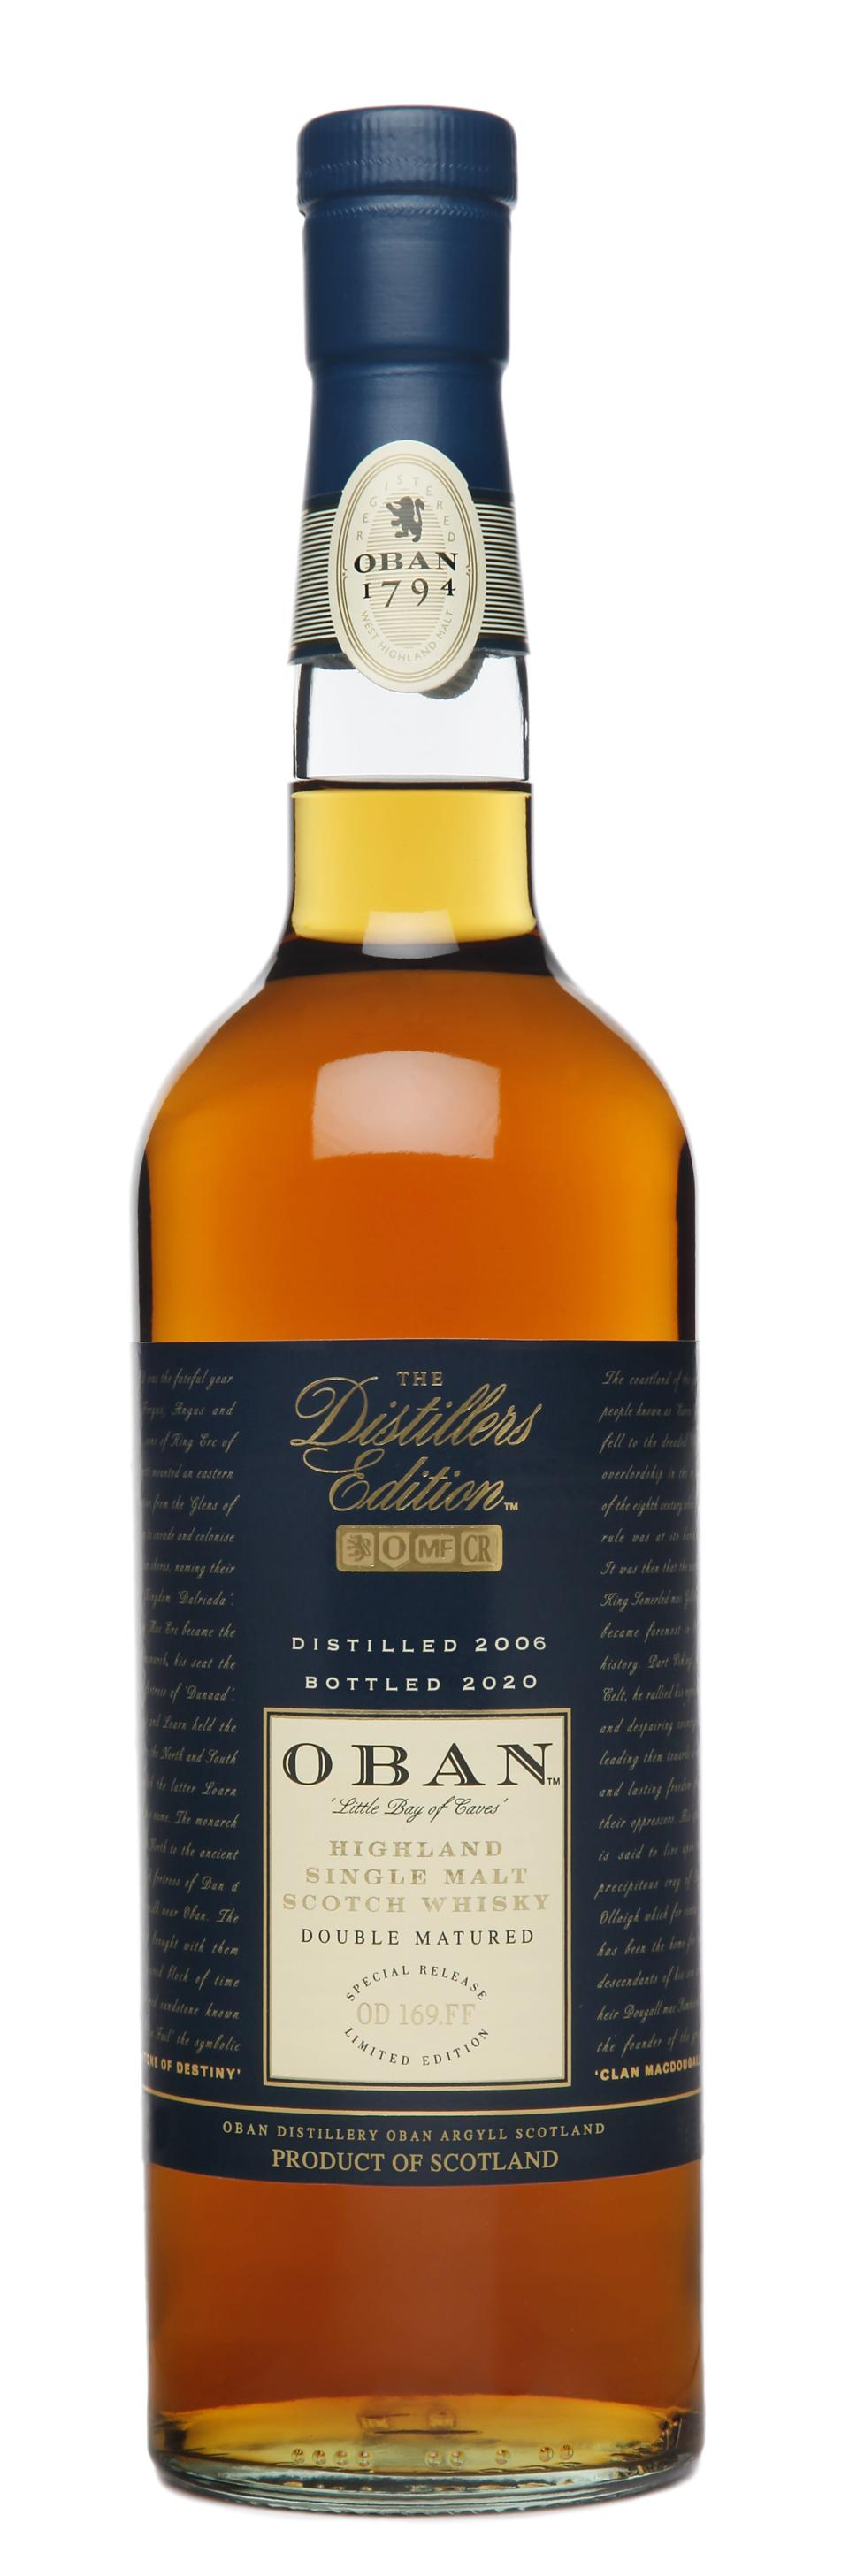 Bottle of Oban 2020 Distiller's Edition Scotch